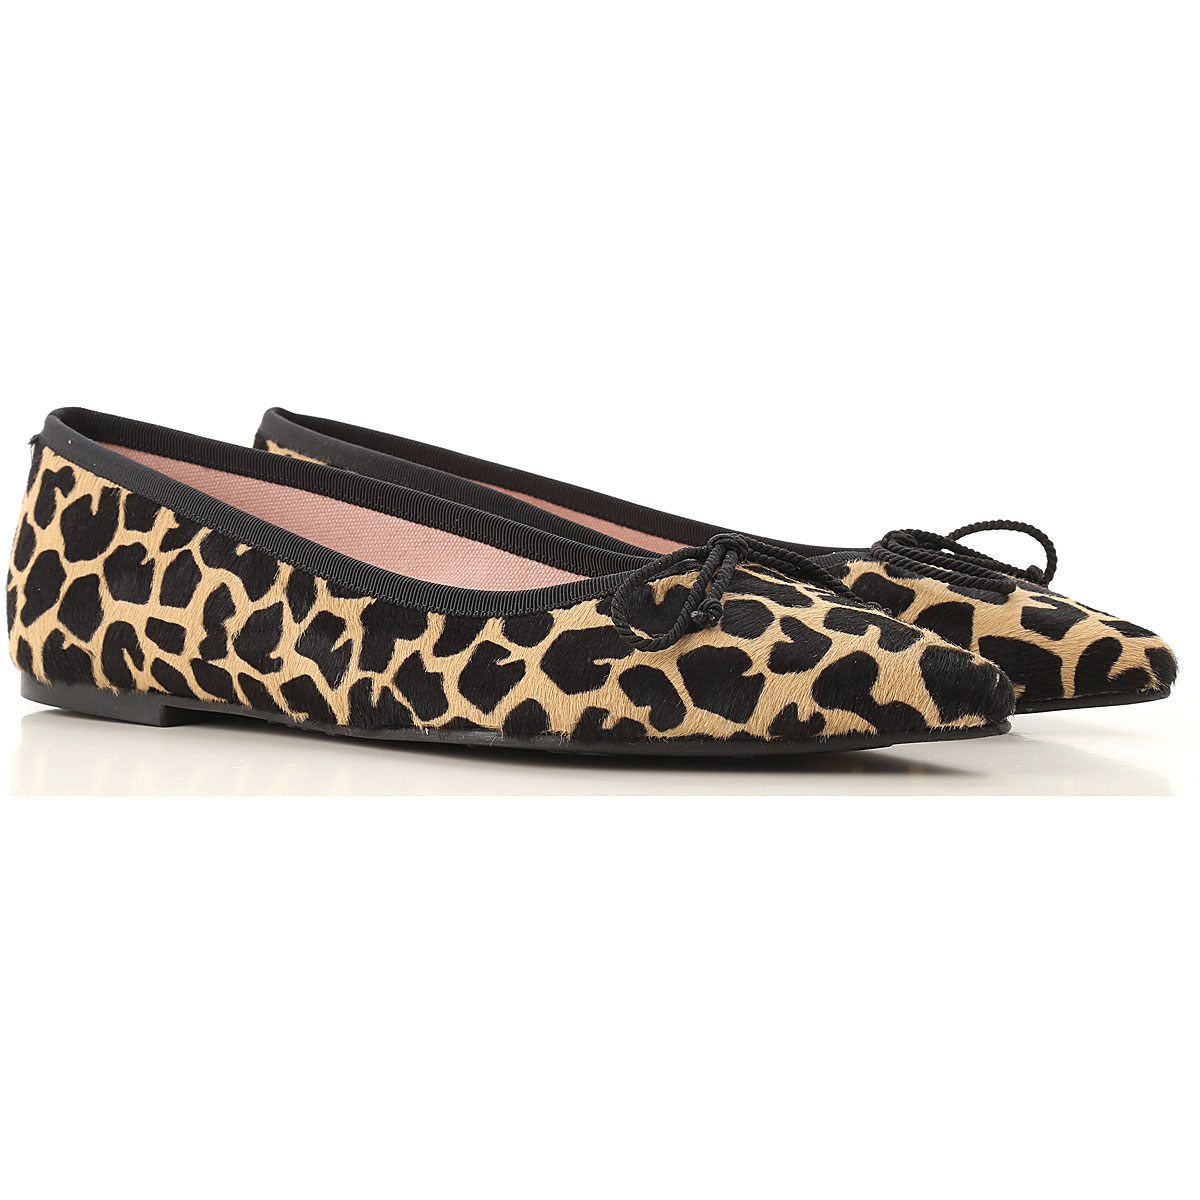 Pretty Ballerinas Ballet Flats Ballerina Shoes for Women On Sale in Outlet, Leopard, Fur, 2019, 6 7